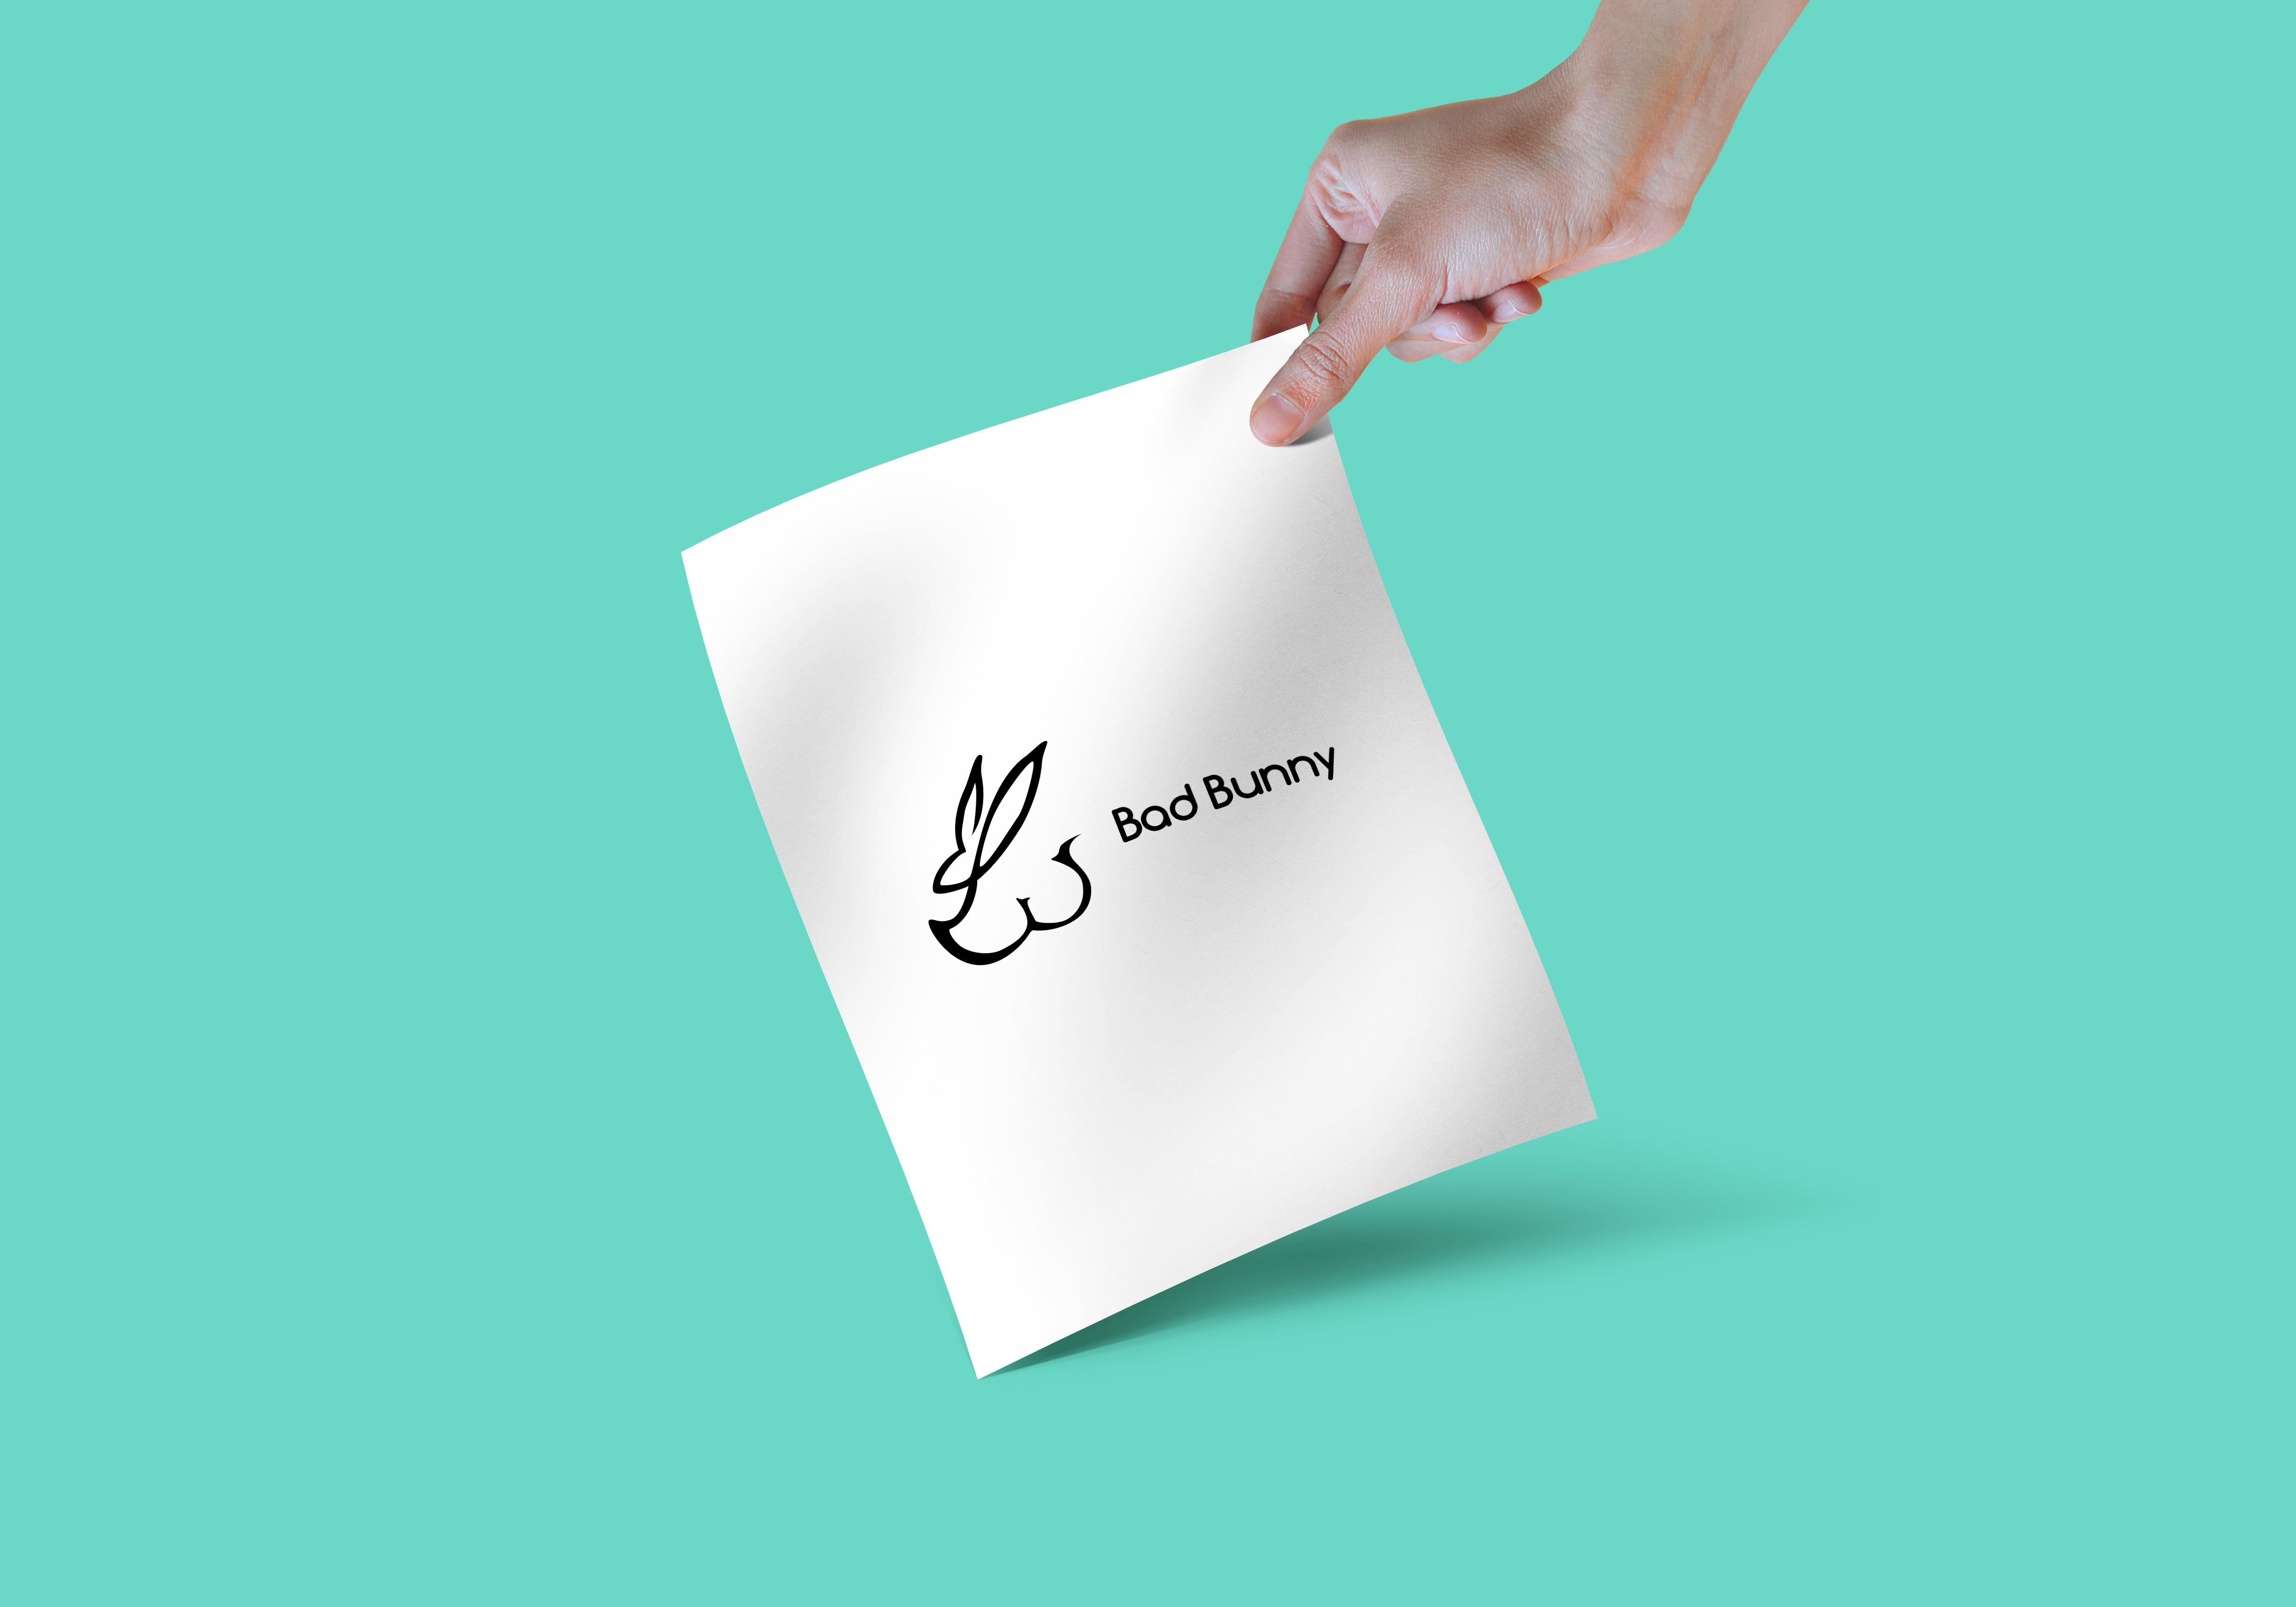 Bad bunny swimsuit logo graphic design Vancouver created by Feifei Digital Ltd Agency | Monika Szucs